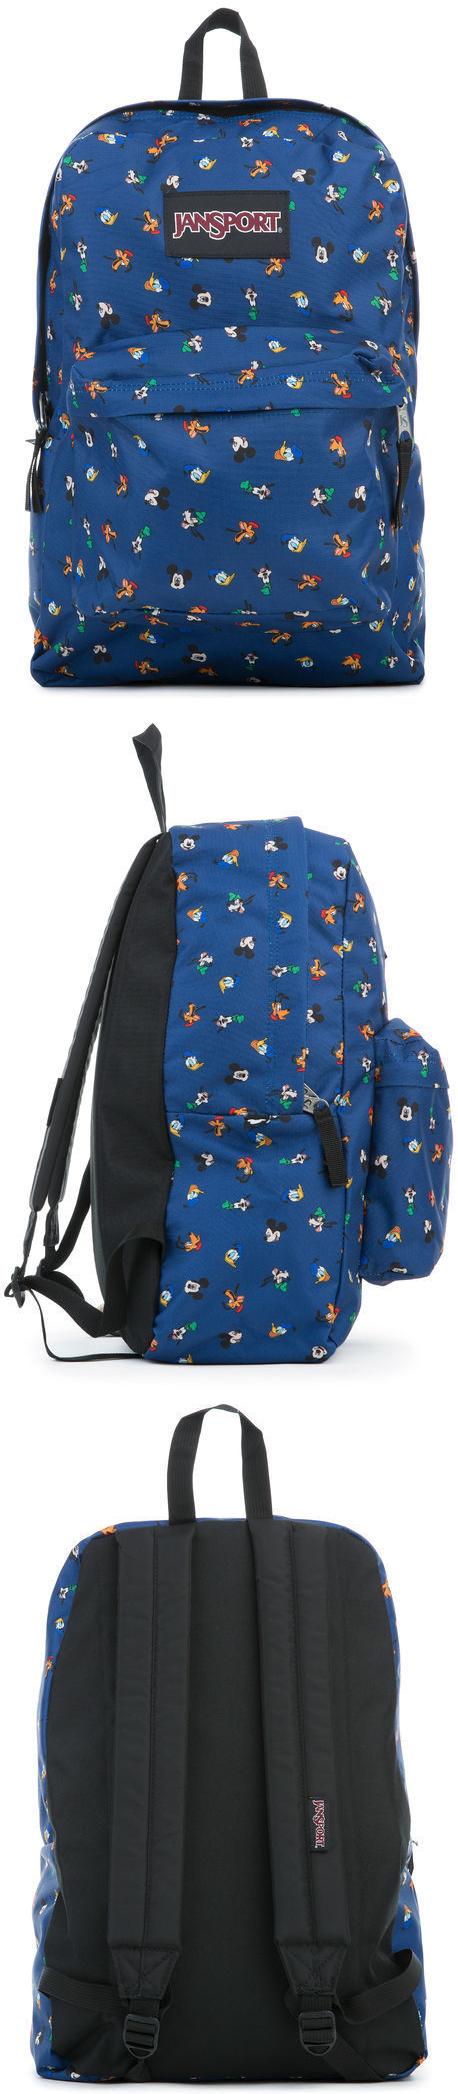 daaa7b3e831 Jansport Disney Gang Dot Backpack